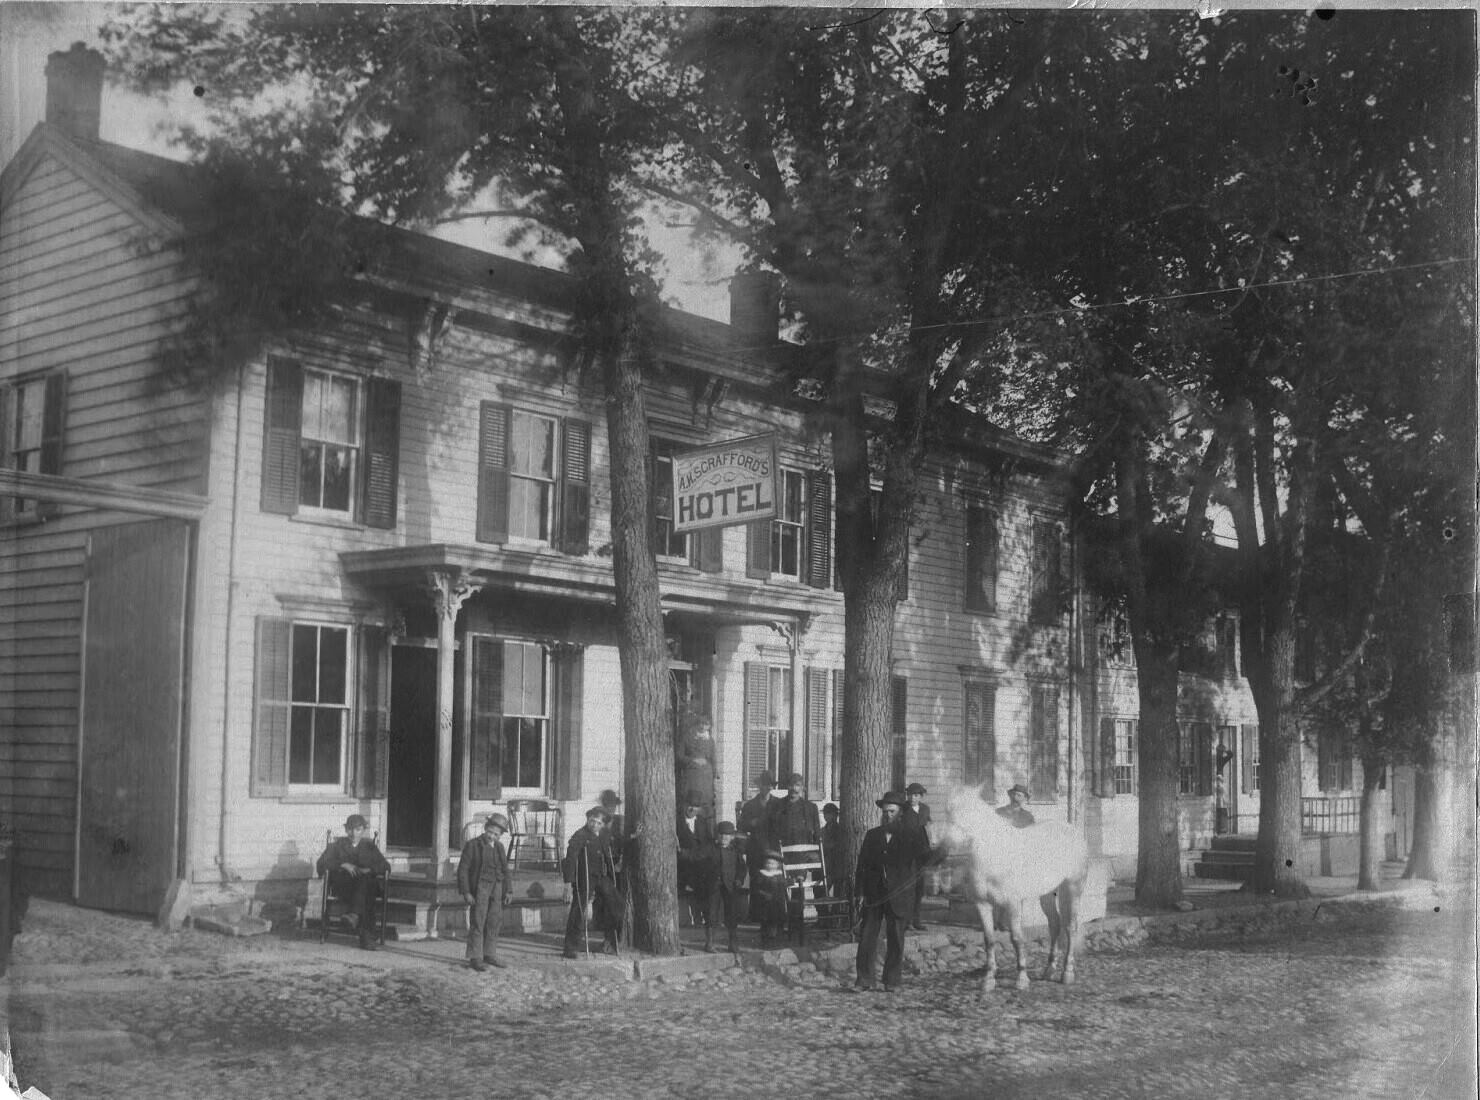 Scrafford Hotel Washington Ave 1905, where Van Curler Hotel Garage was